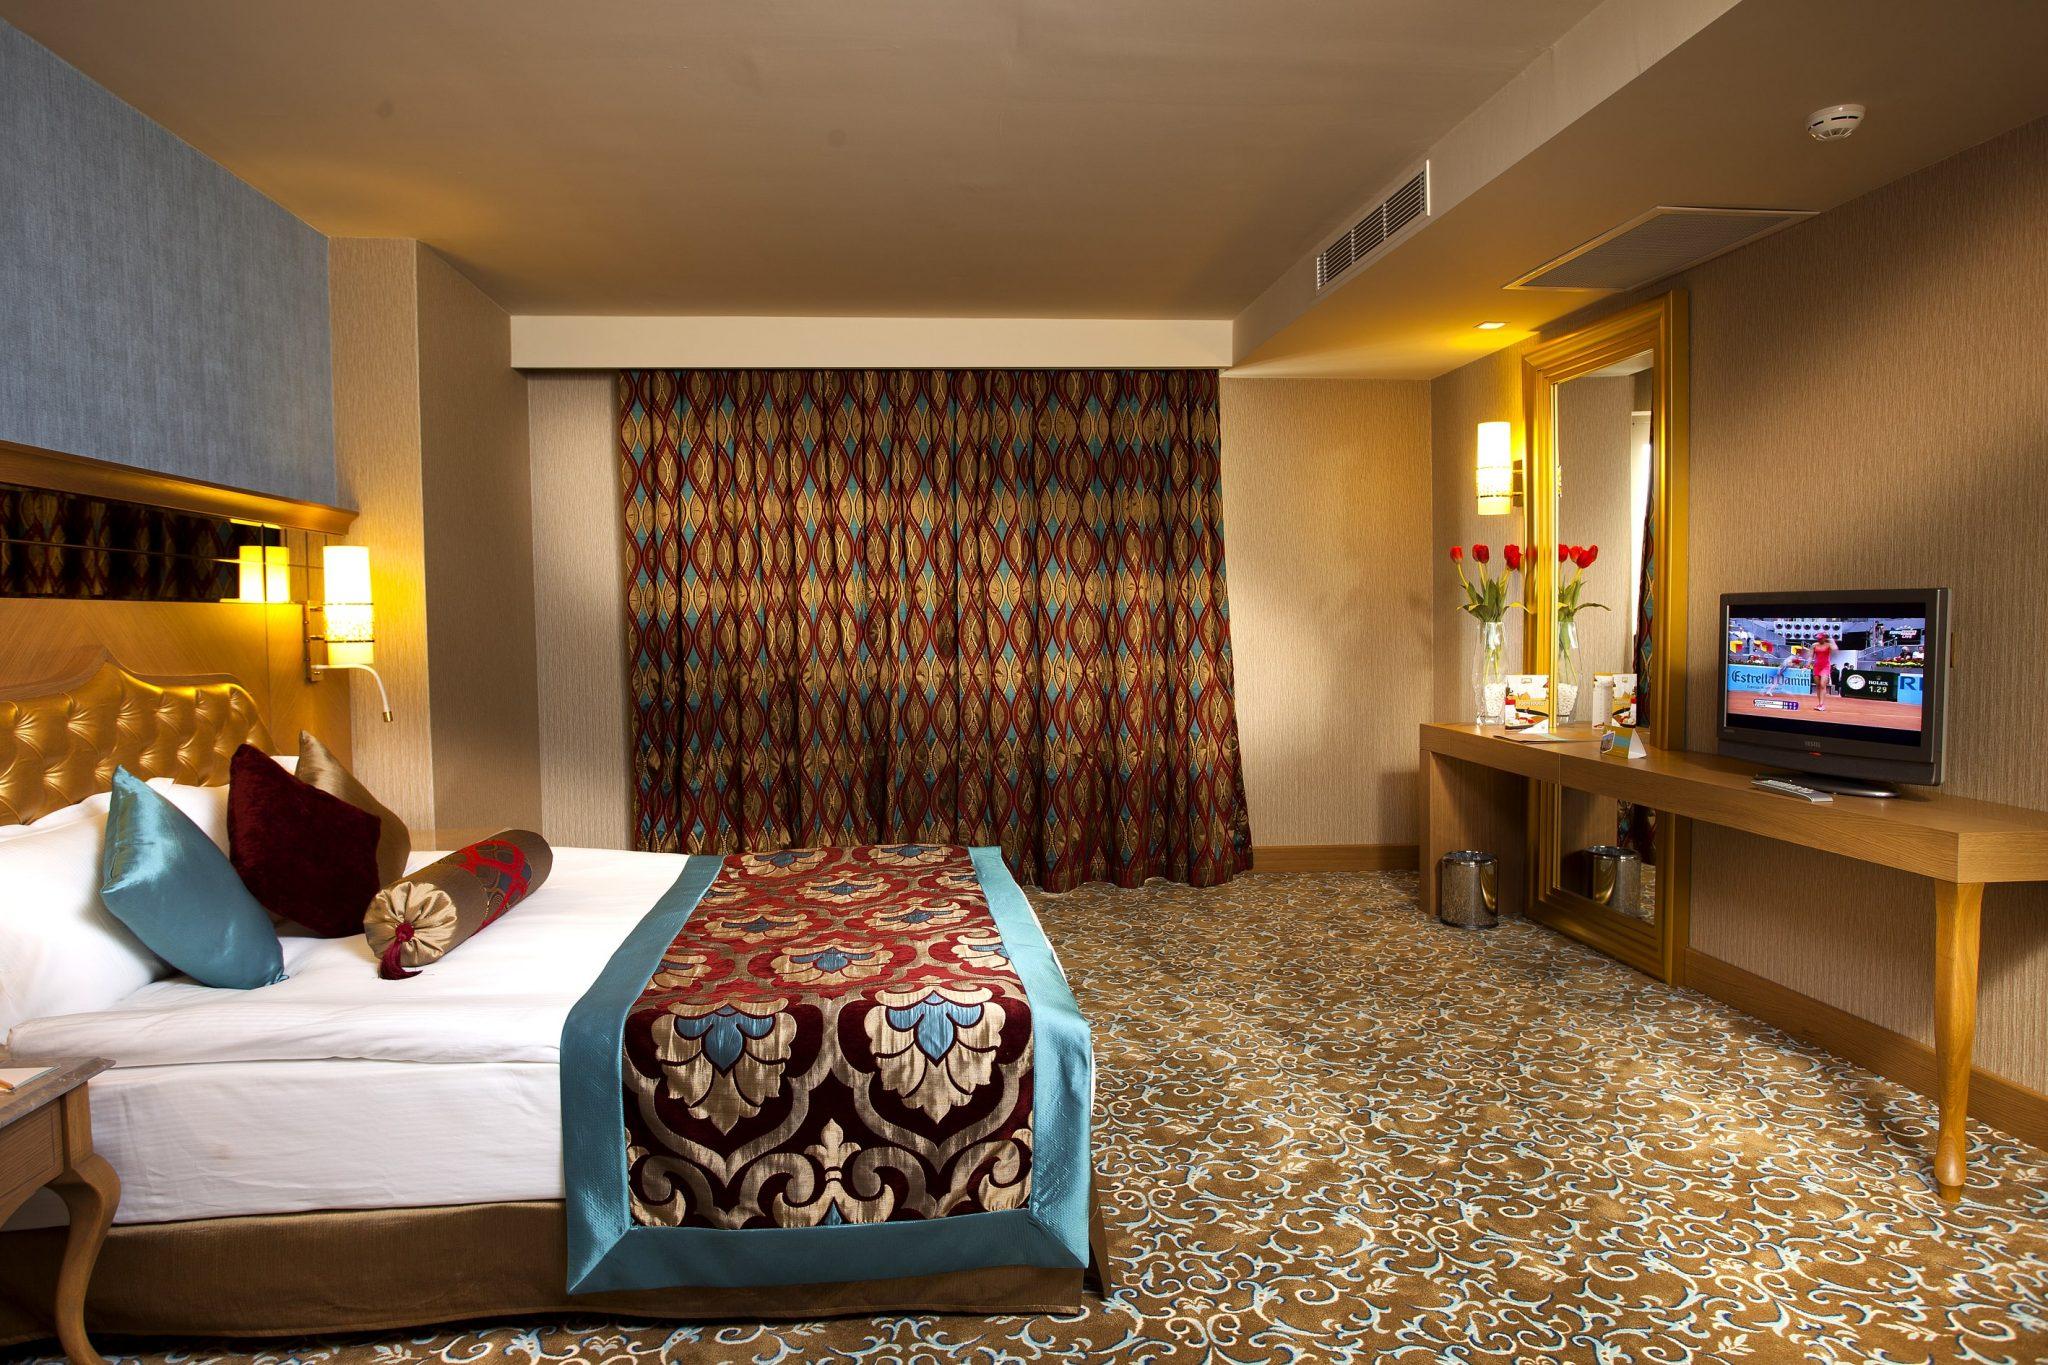 Letovanje_Turska_Hoteli_Avio_Antalija_Hotel_Royal_Holiday_Palace-19-scaled.jpg